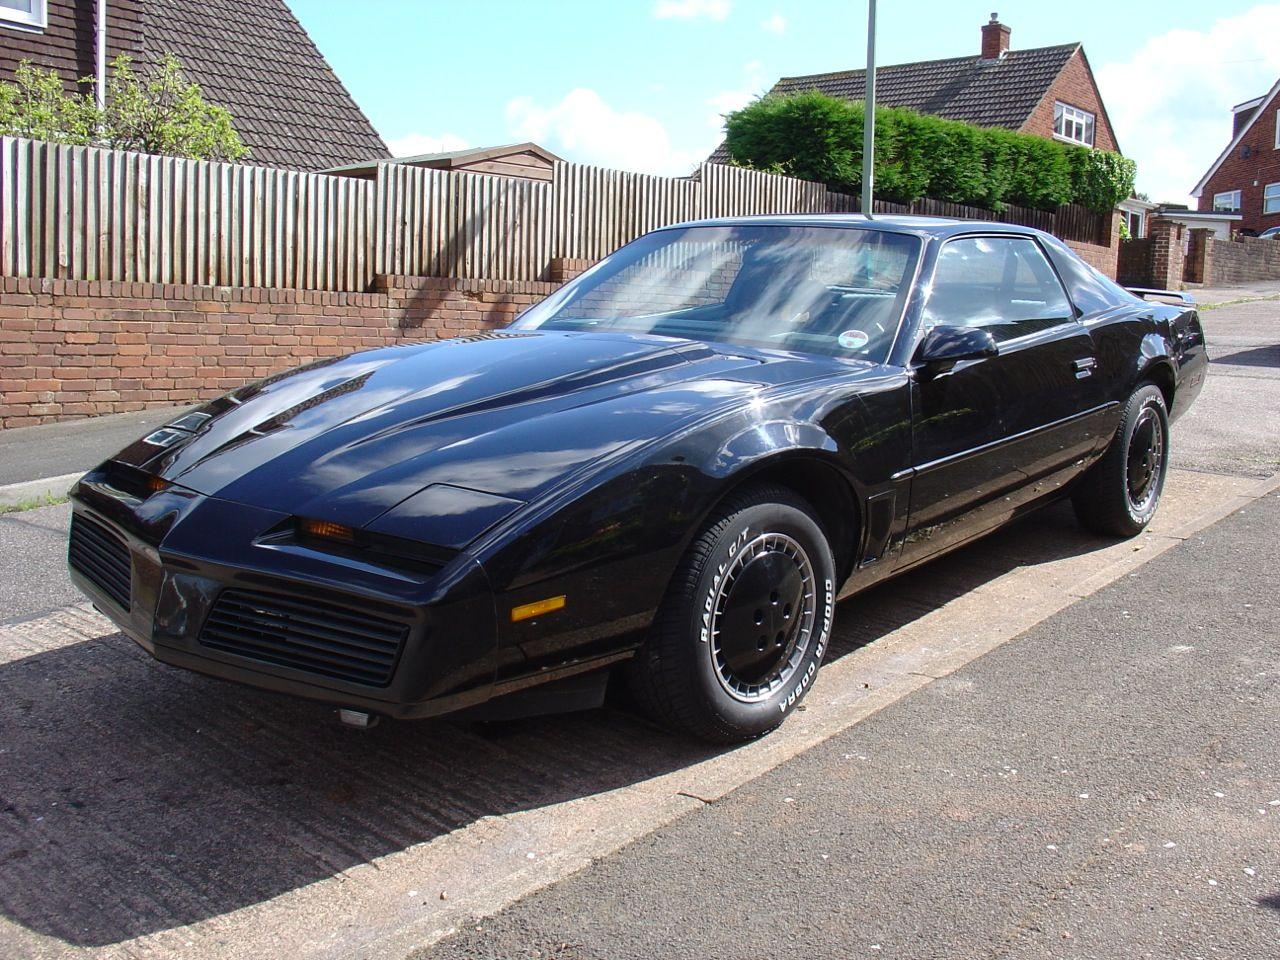 1982 pontiac trans am cars automobile vehicles cars. Black Bedroom Furniture Sets. Home Design Ideas